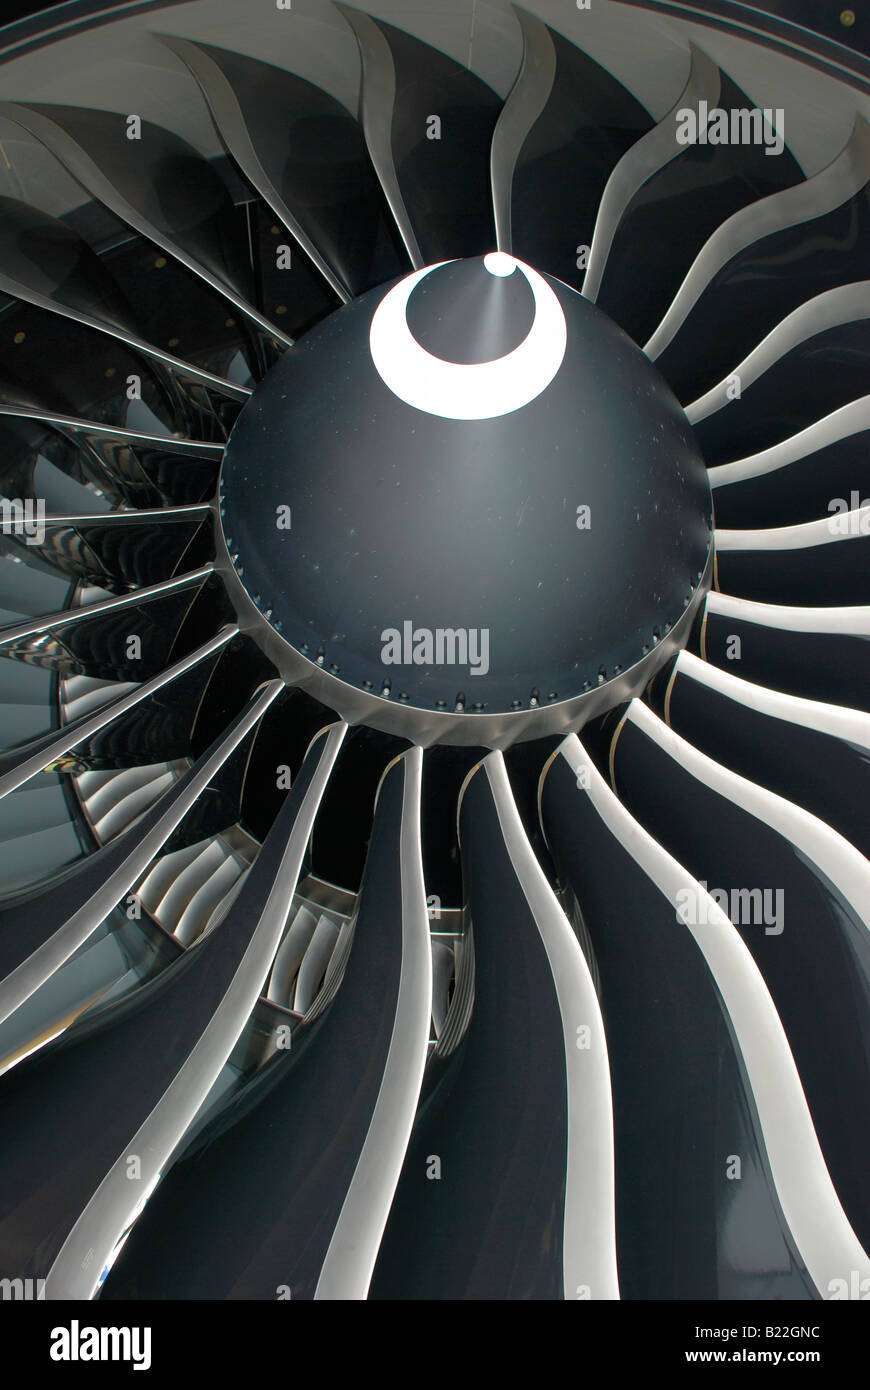 boeing 777 jet engine blades.largest turbofan engine in service. - Stock Image